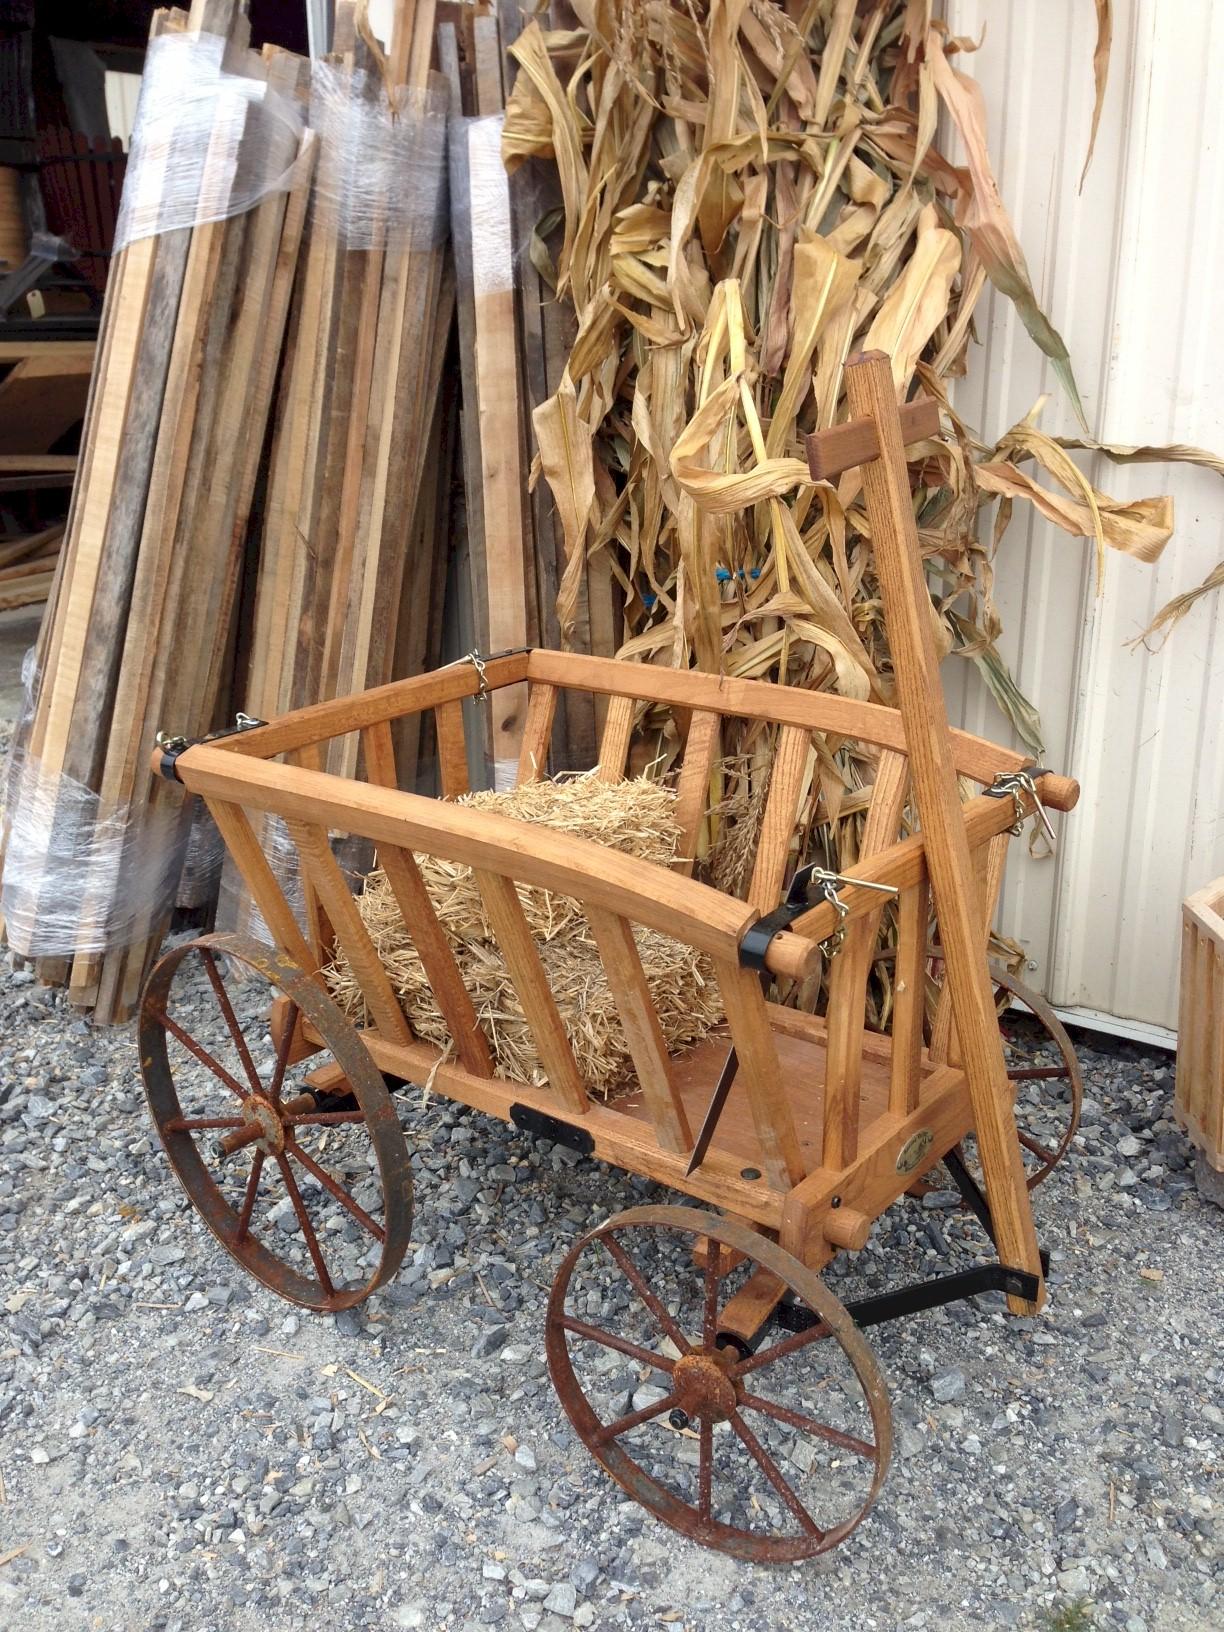 Goat Wagons Amish Wooden Goat Wagon - Amishshop.com